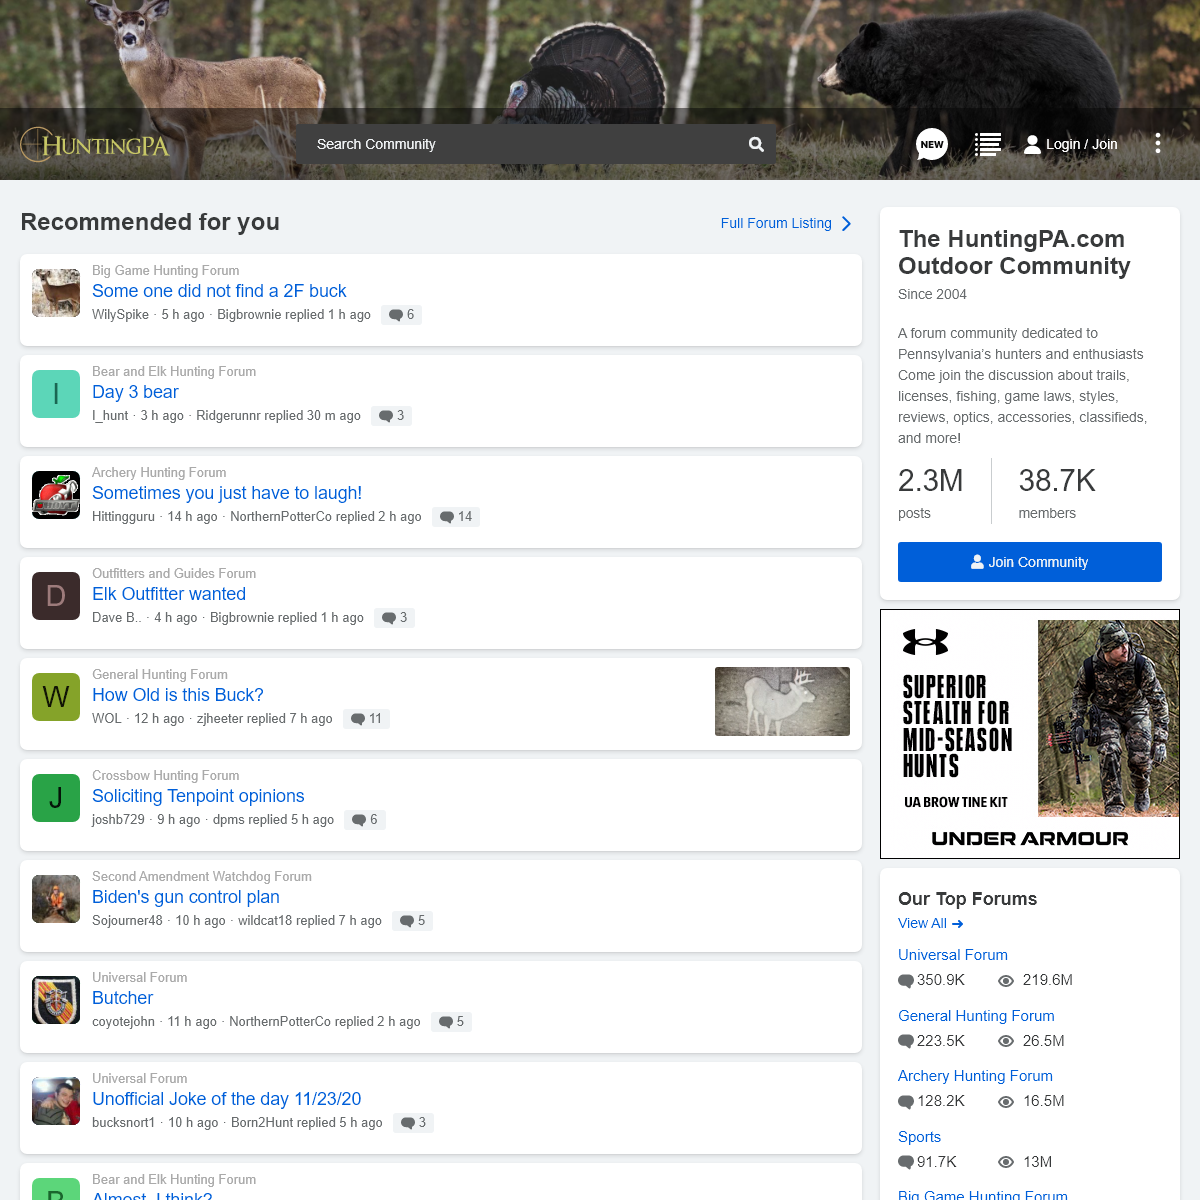 The HuntingPA.com Outdoor Community